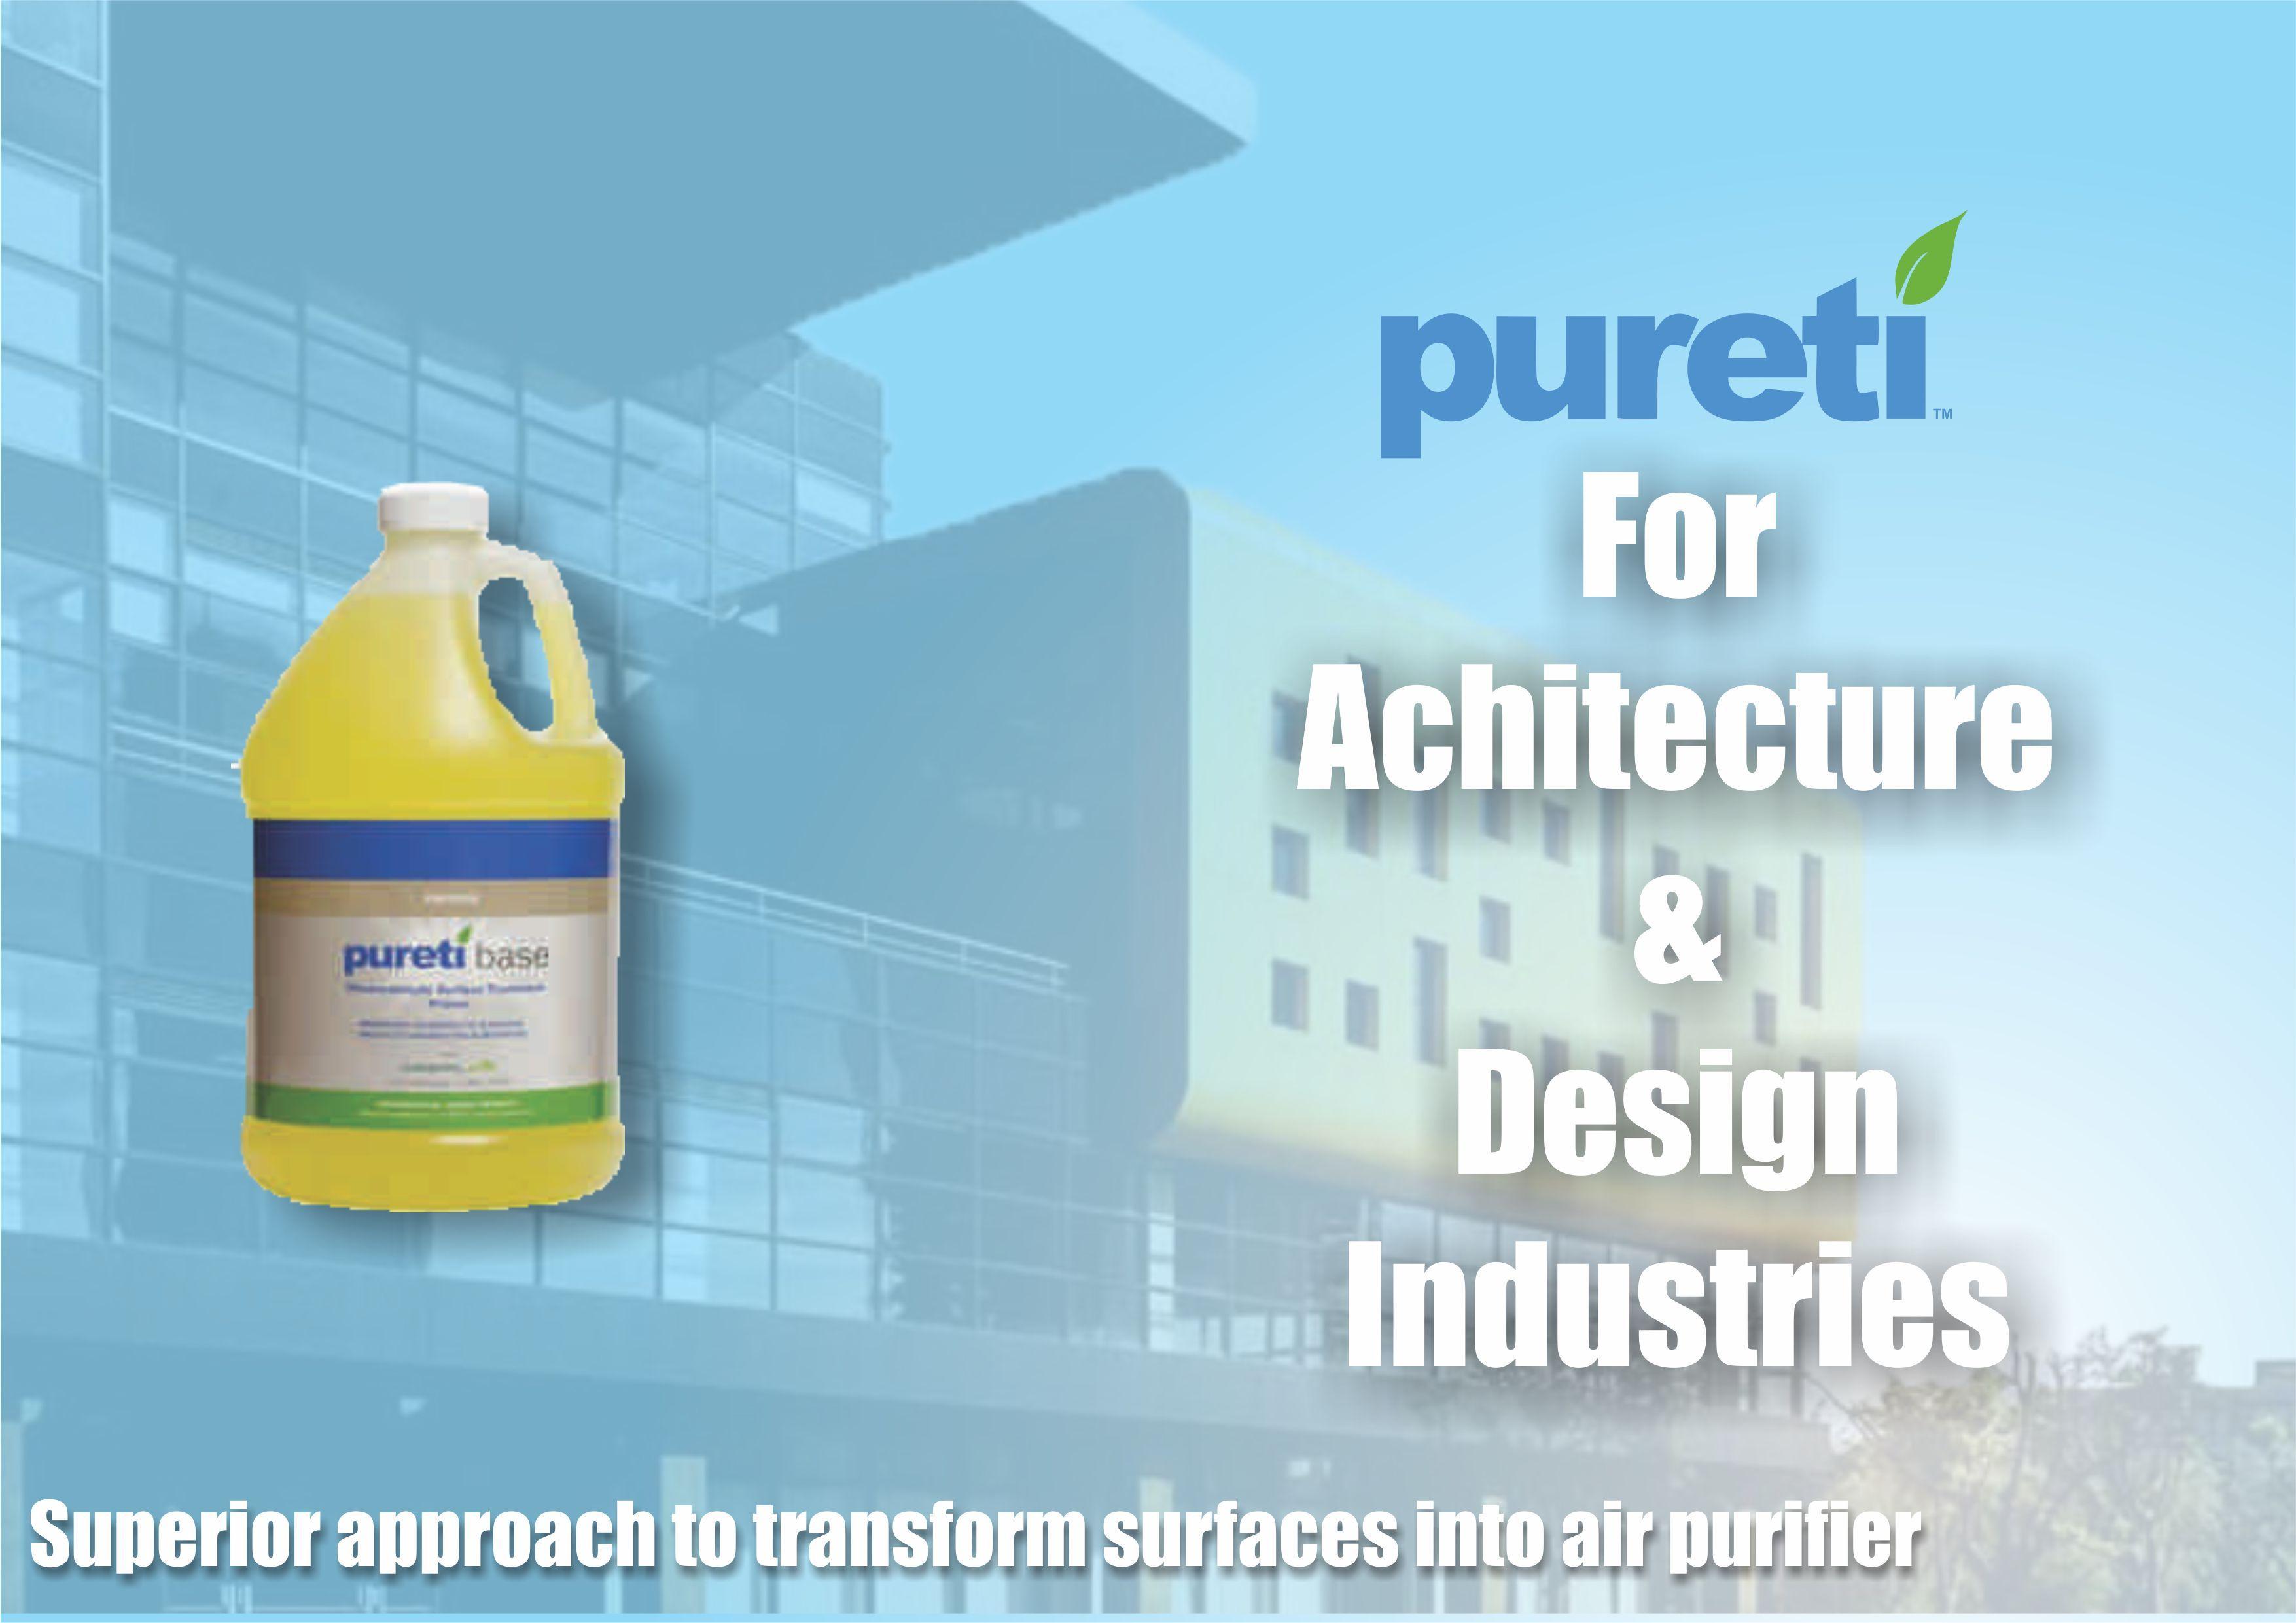 pollutioncontrol airpurifer cleanair smartgrowth